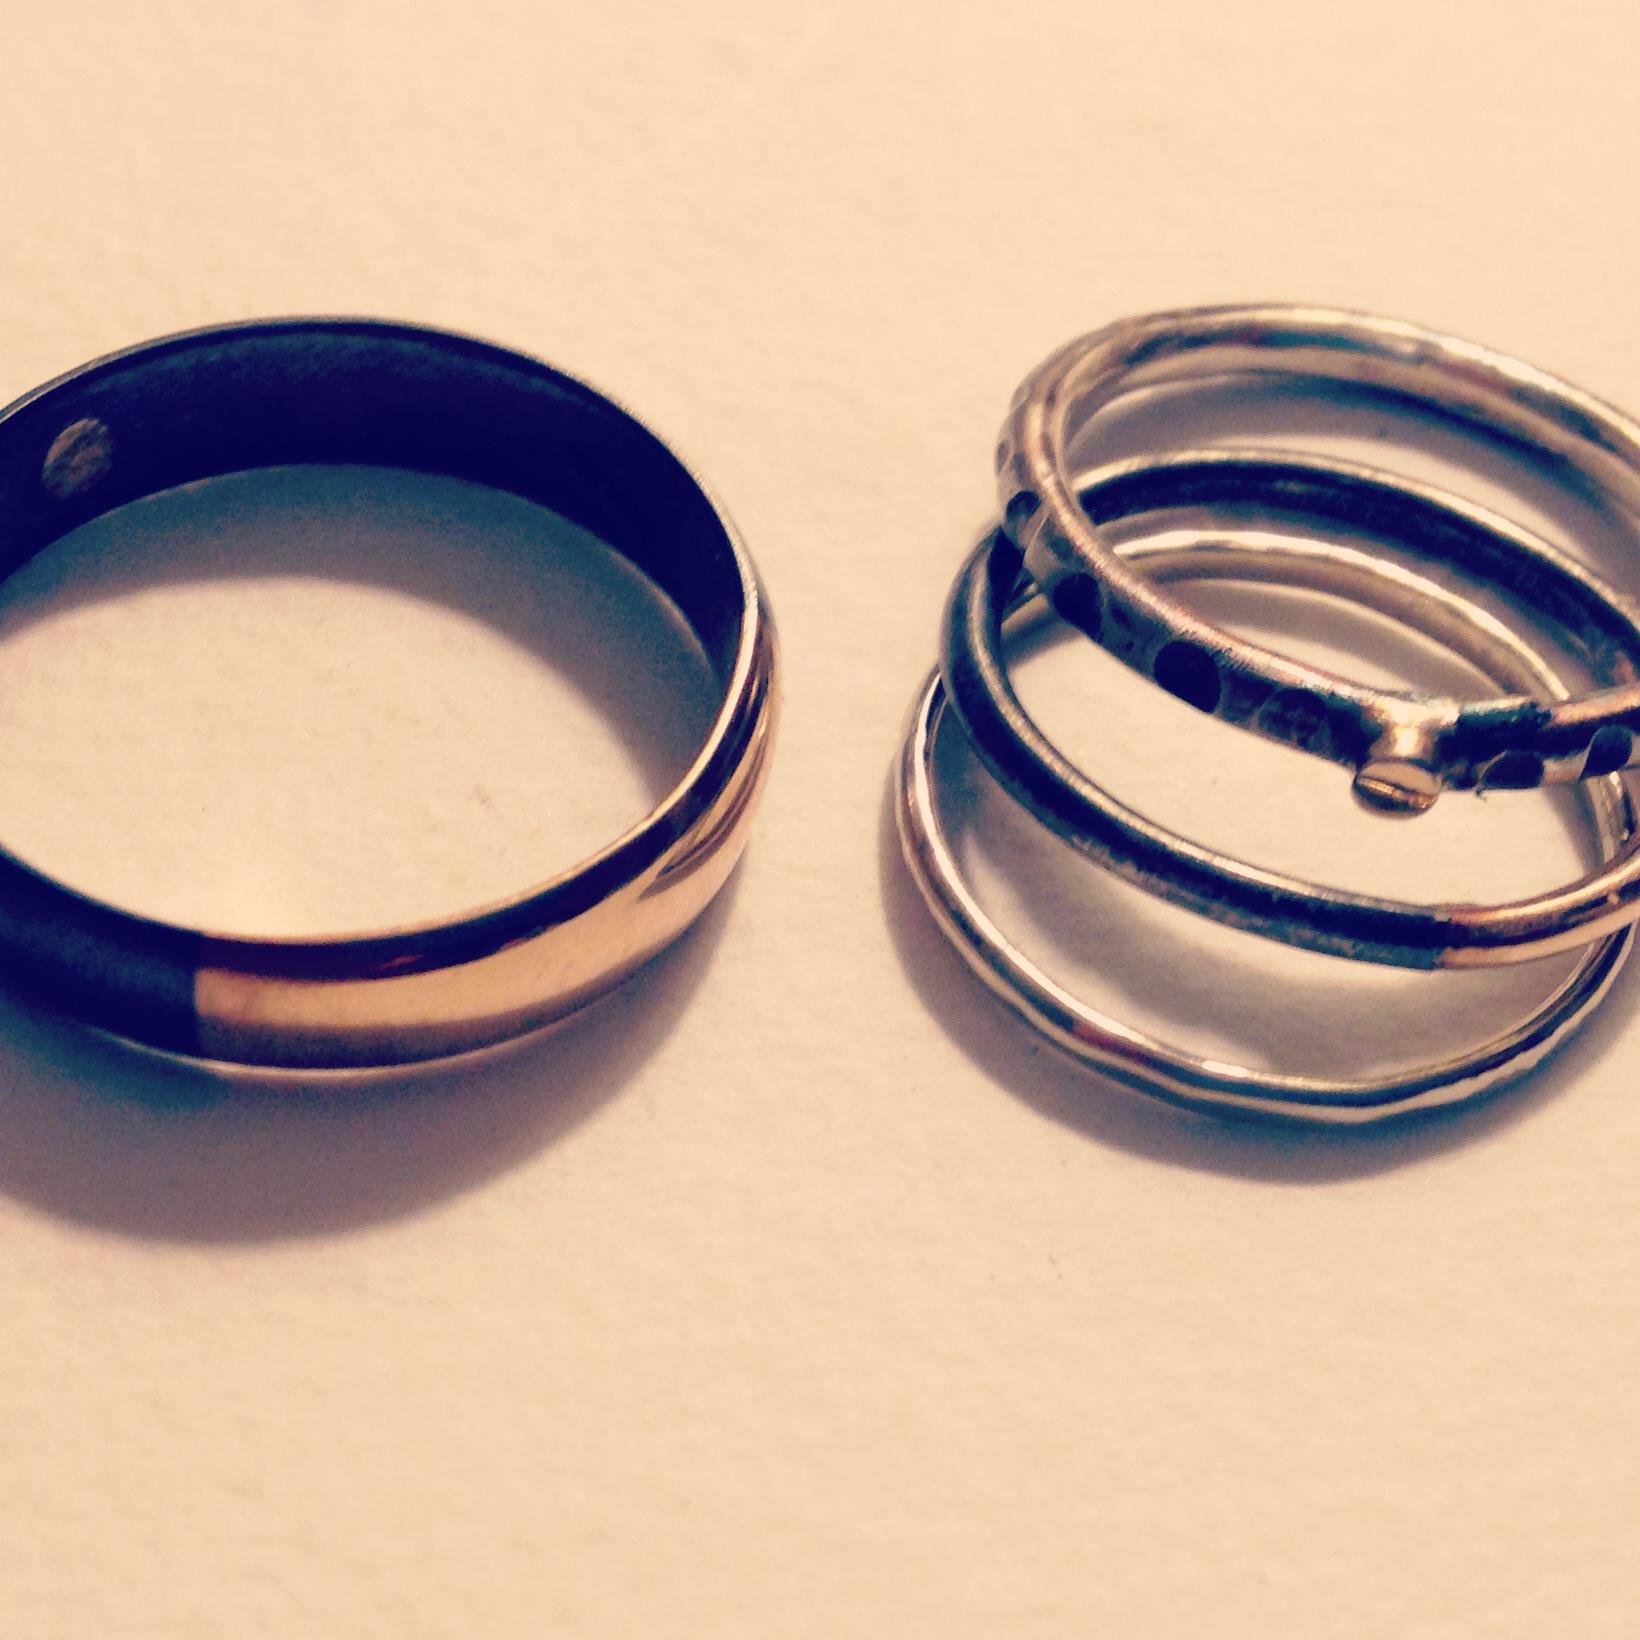 carla + nirav's rings